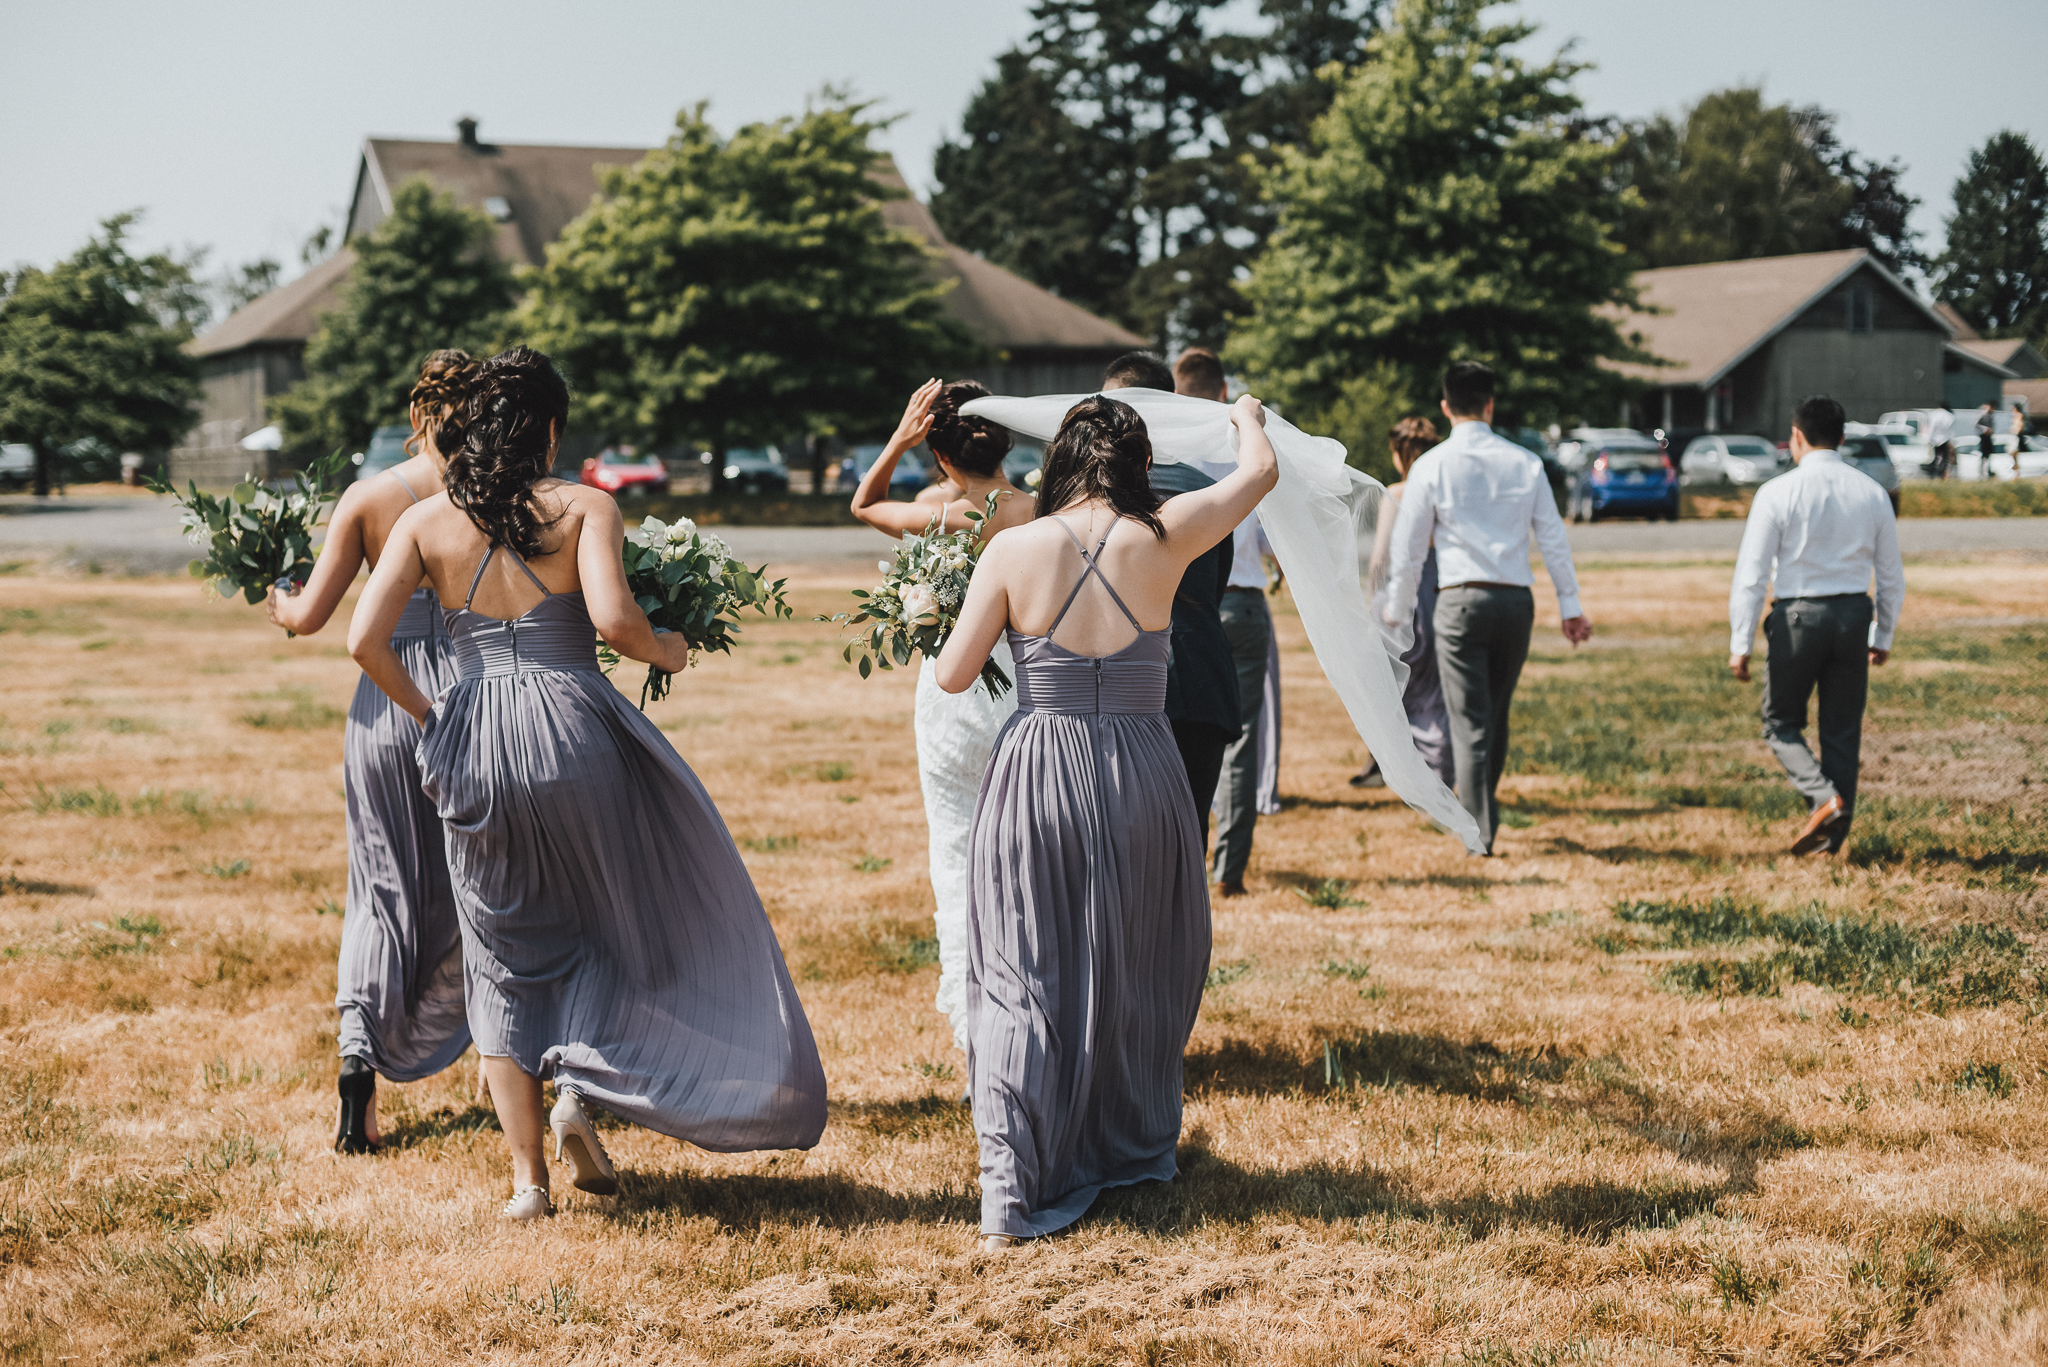 wellbrookwinerywedding-carrieaugustine-thekoebels-4.jpg